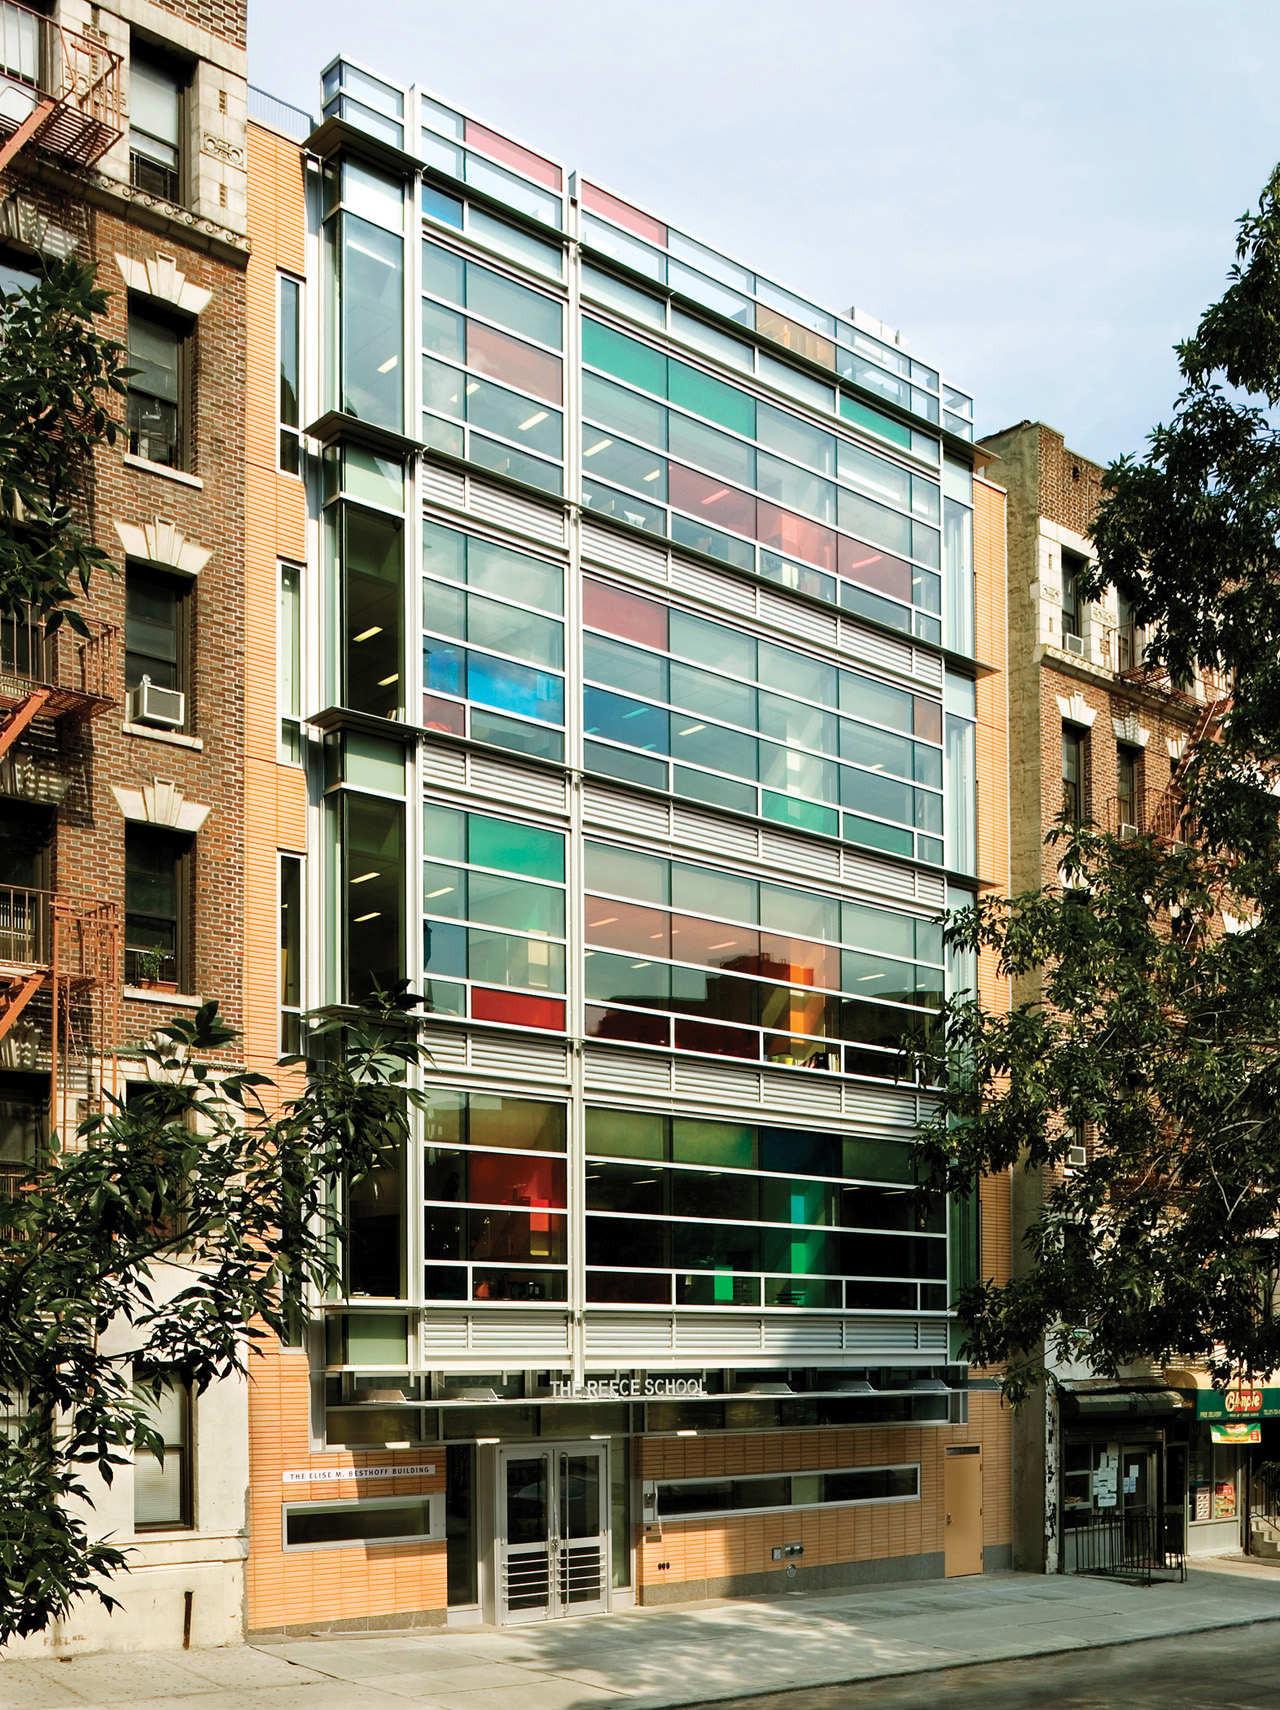 The Reece School Platt Byard Dovell White Architects